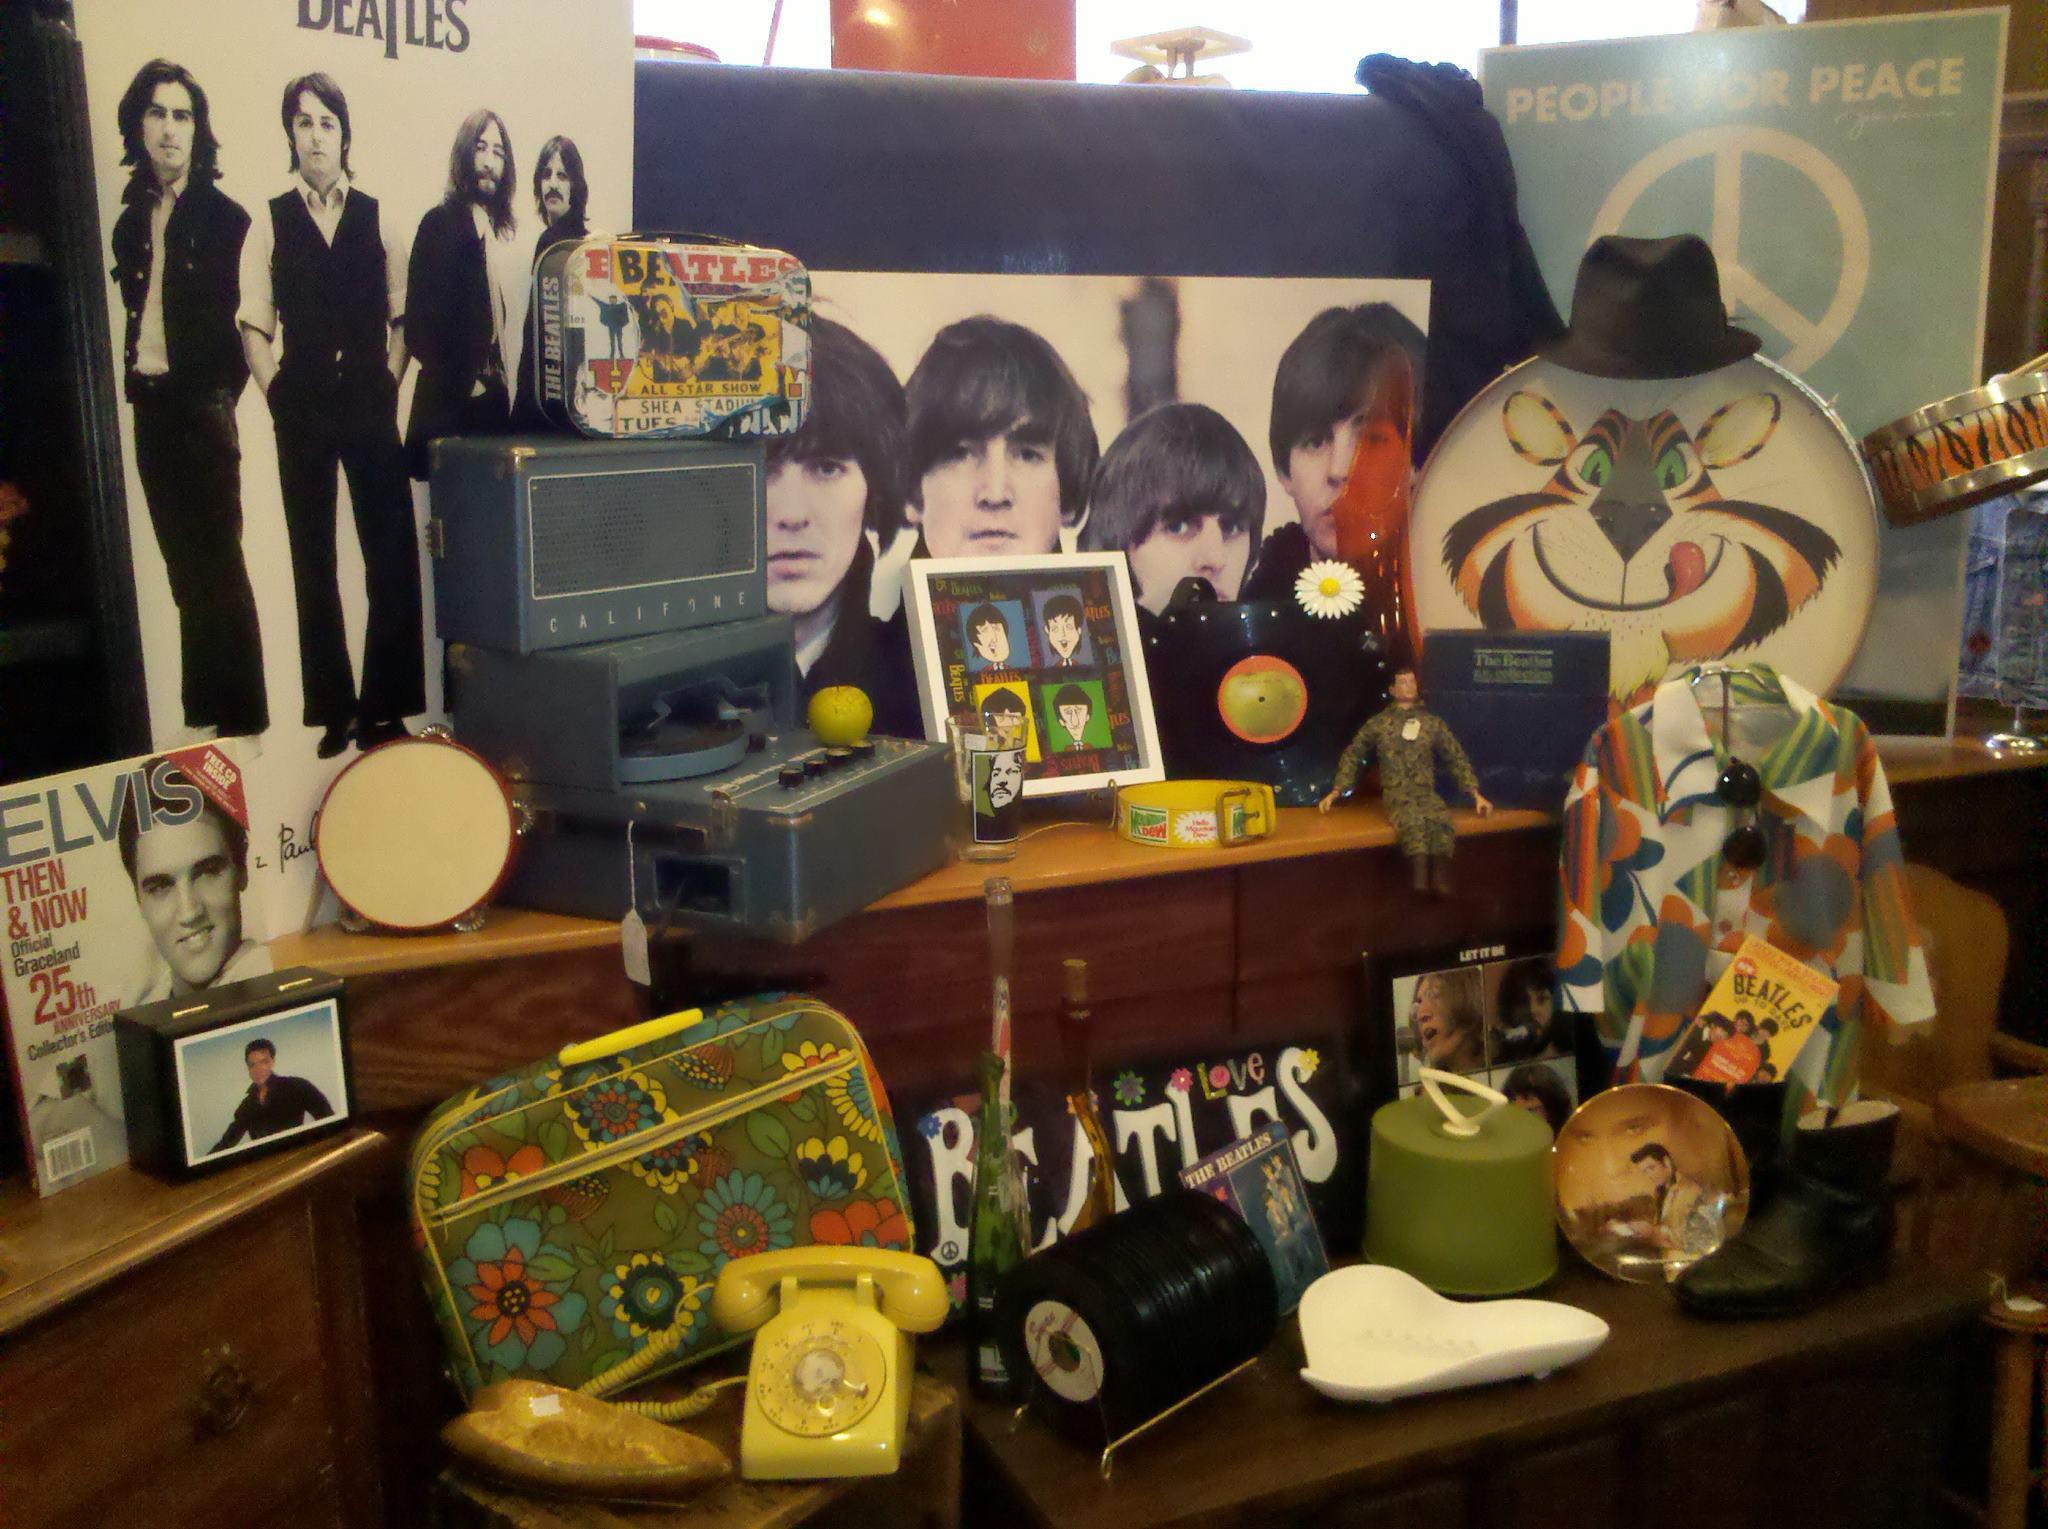 It's Just Serendipity Beatles